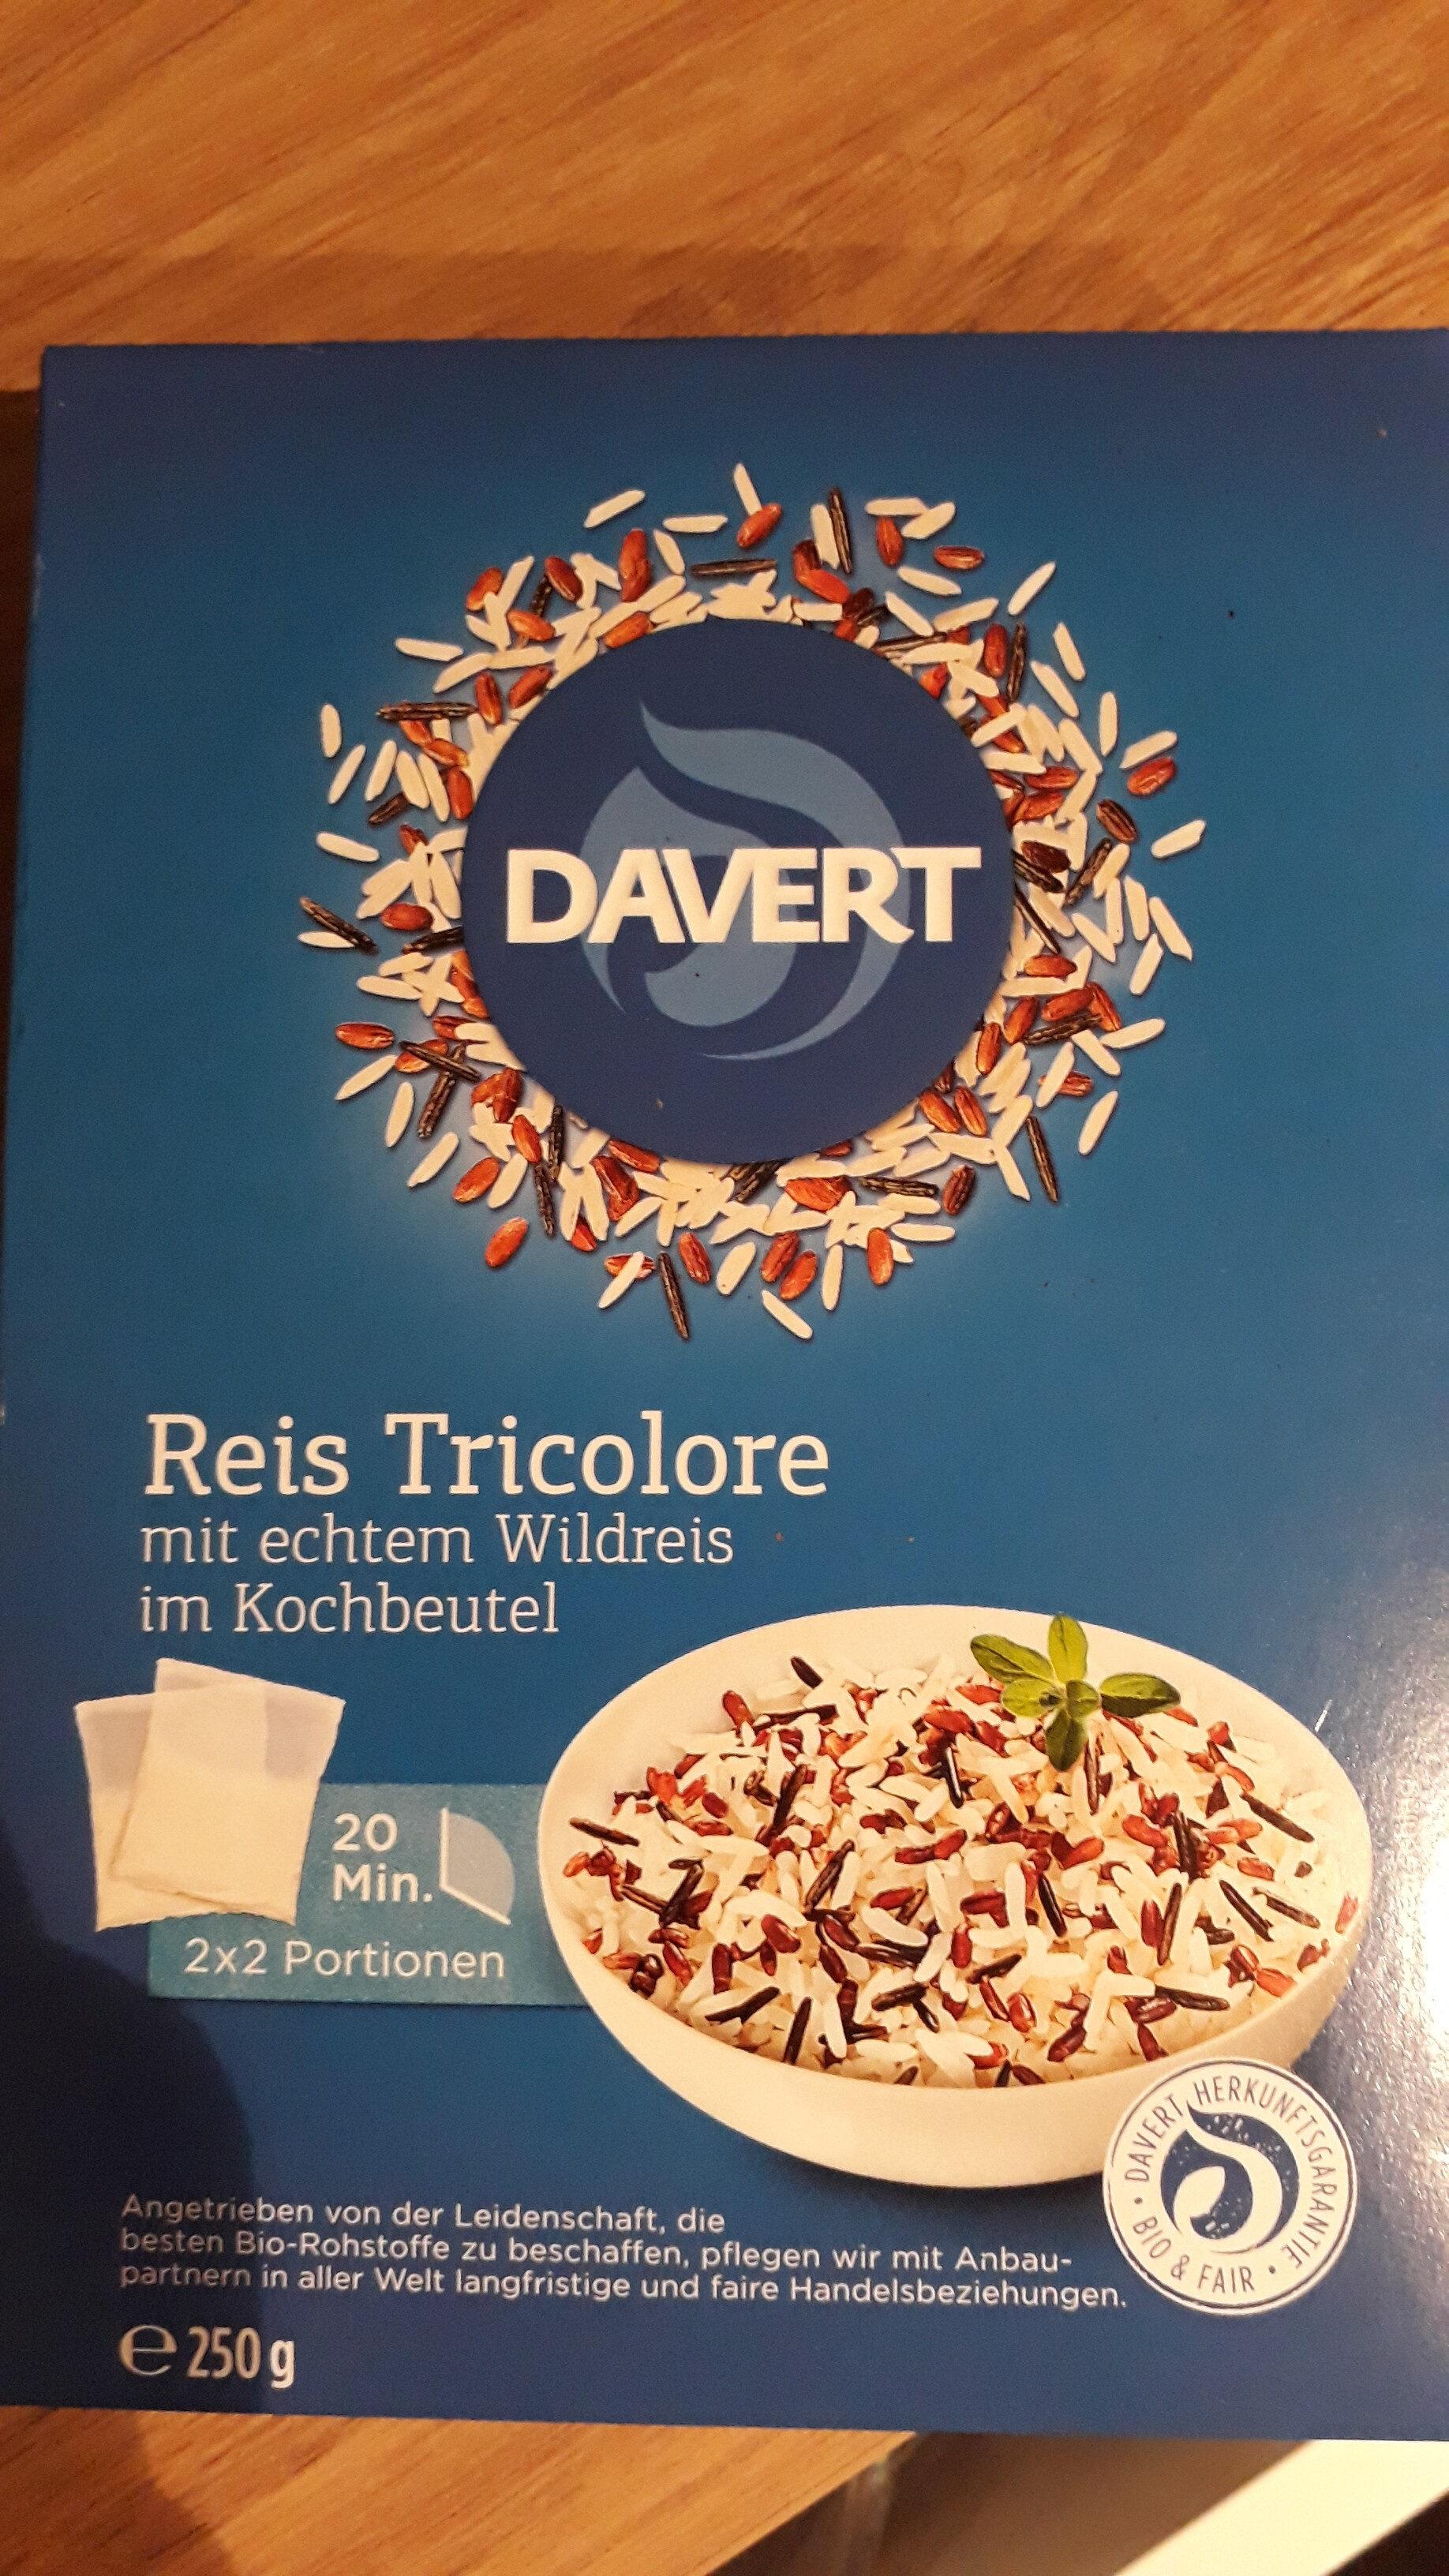 Davert Reis Tricolore mit Wildreis - Product - de